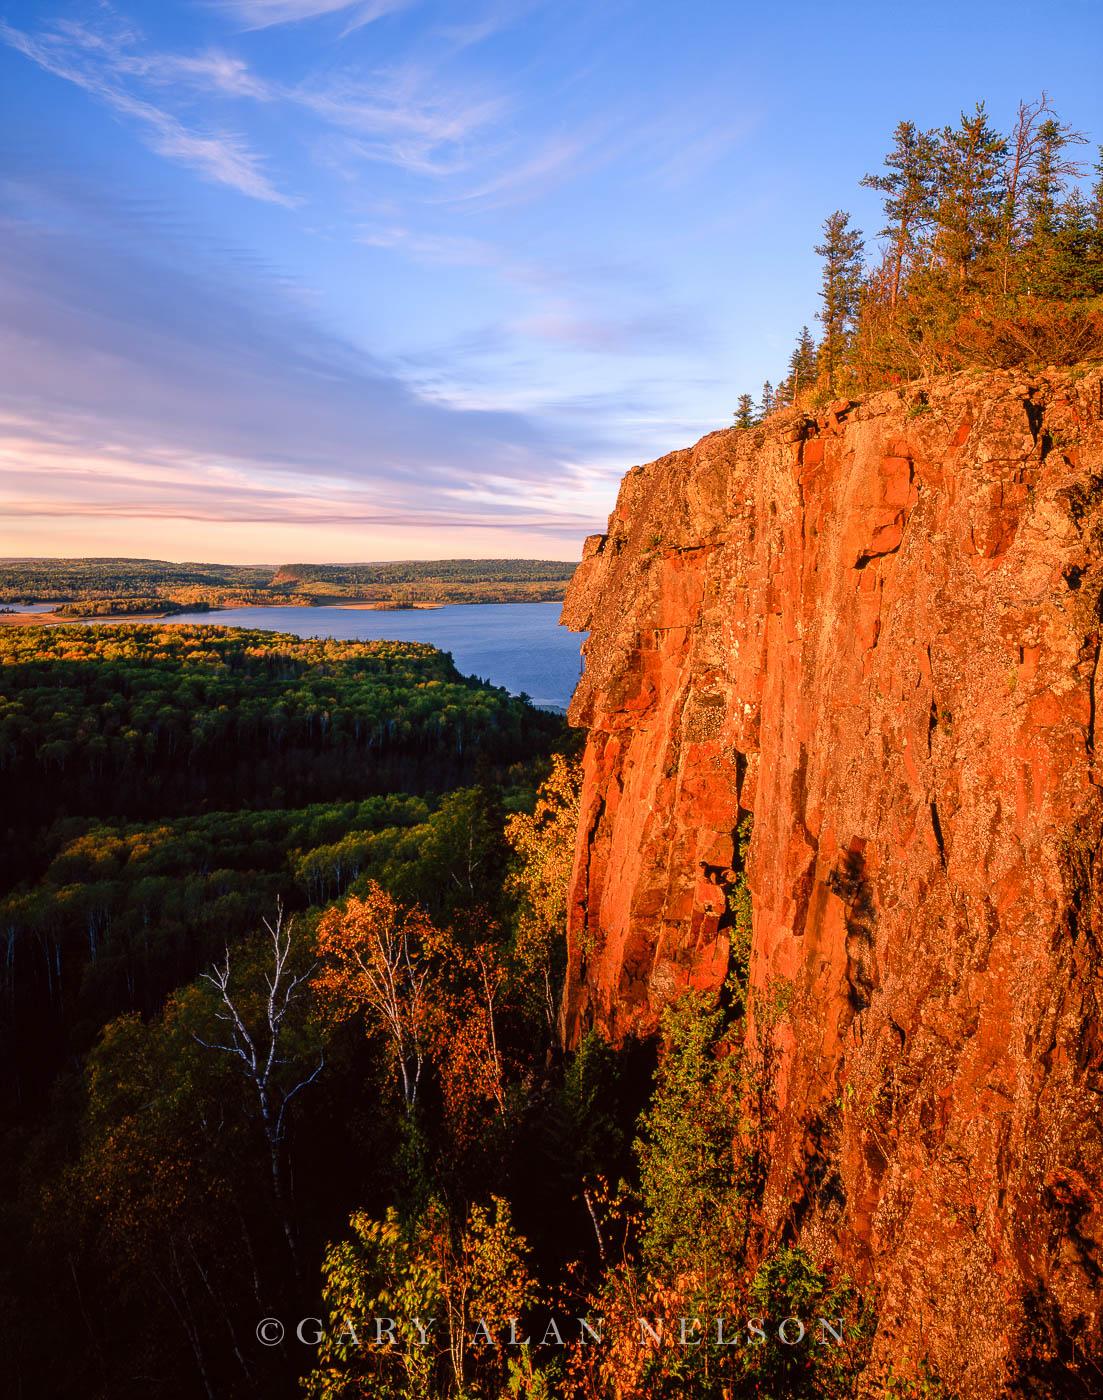 boundary waters canoe area,lake,minnesota, voyageurs national park, photo